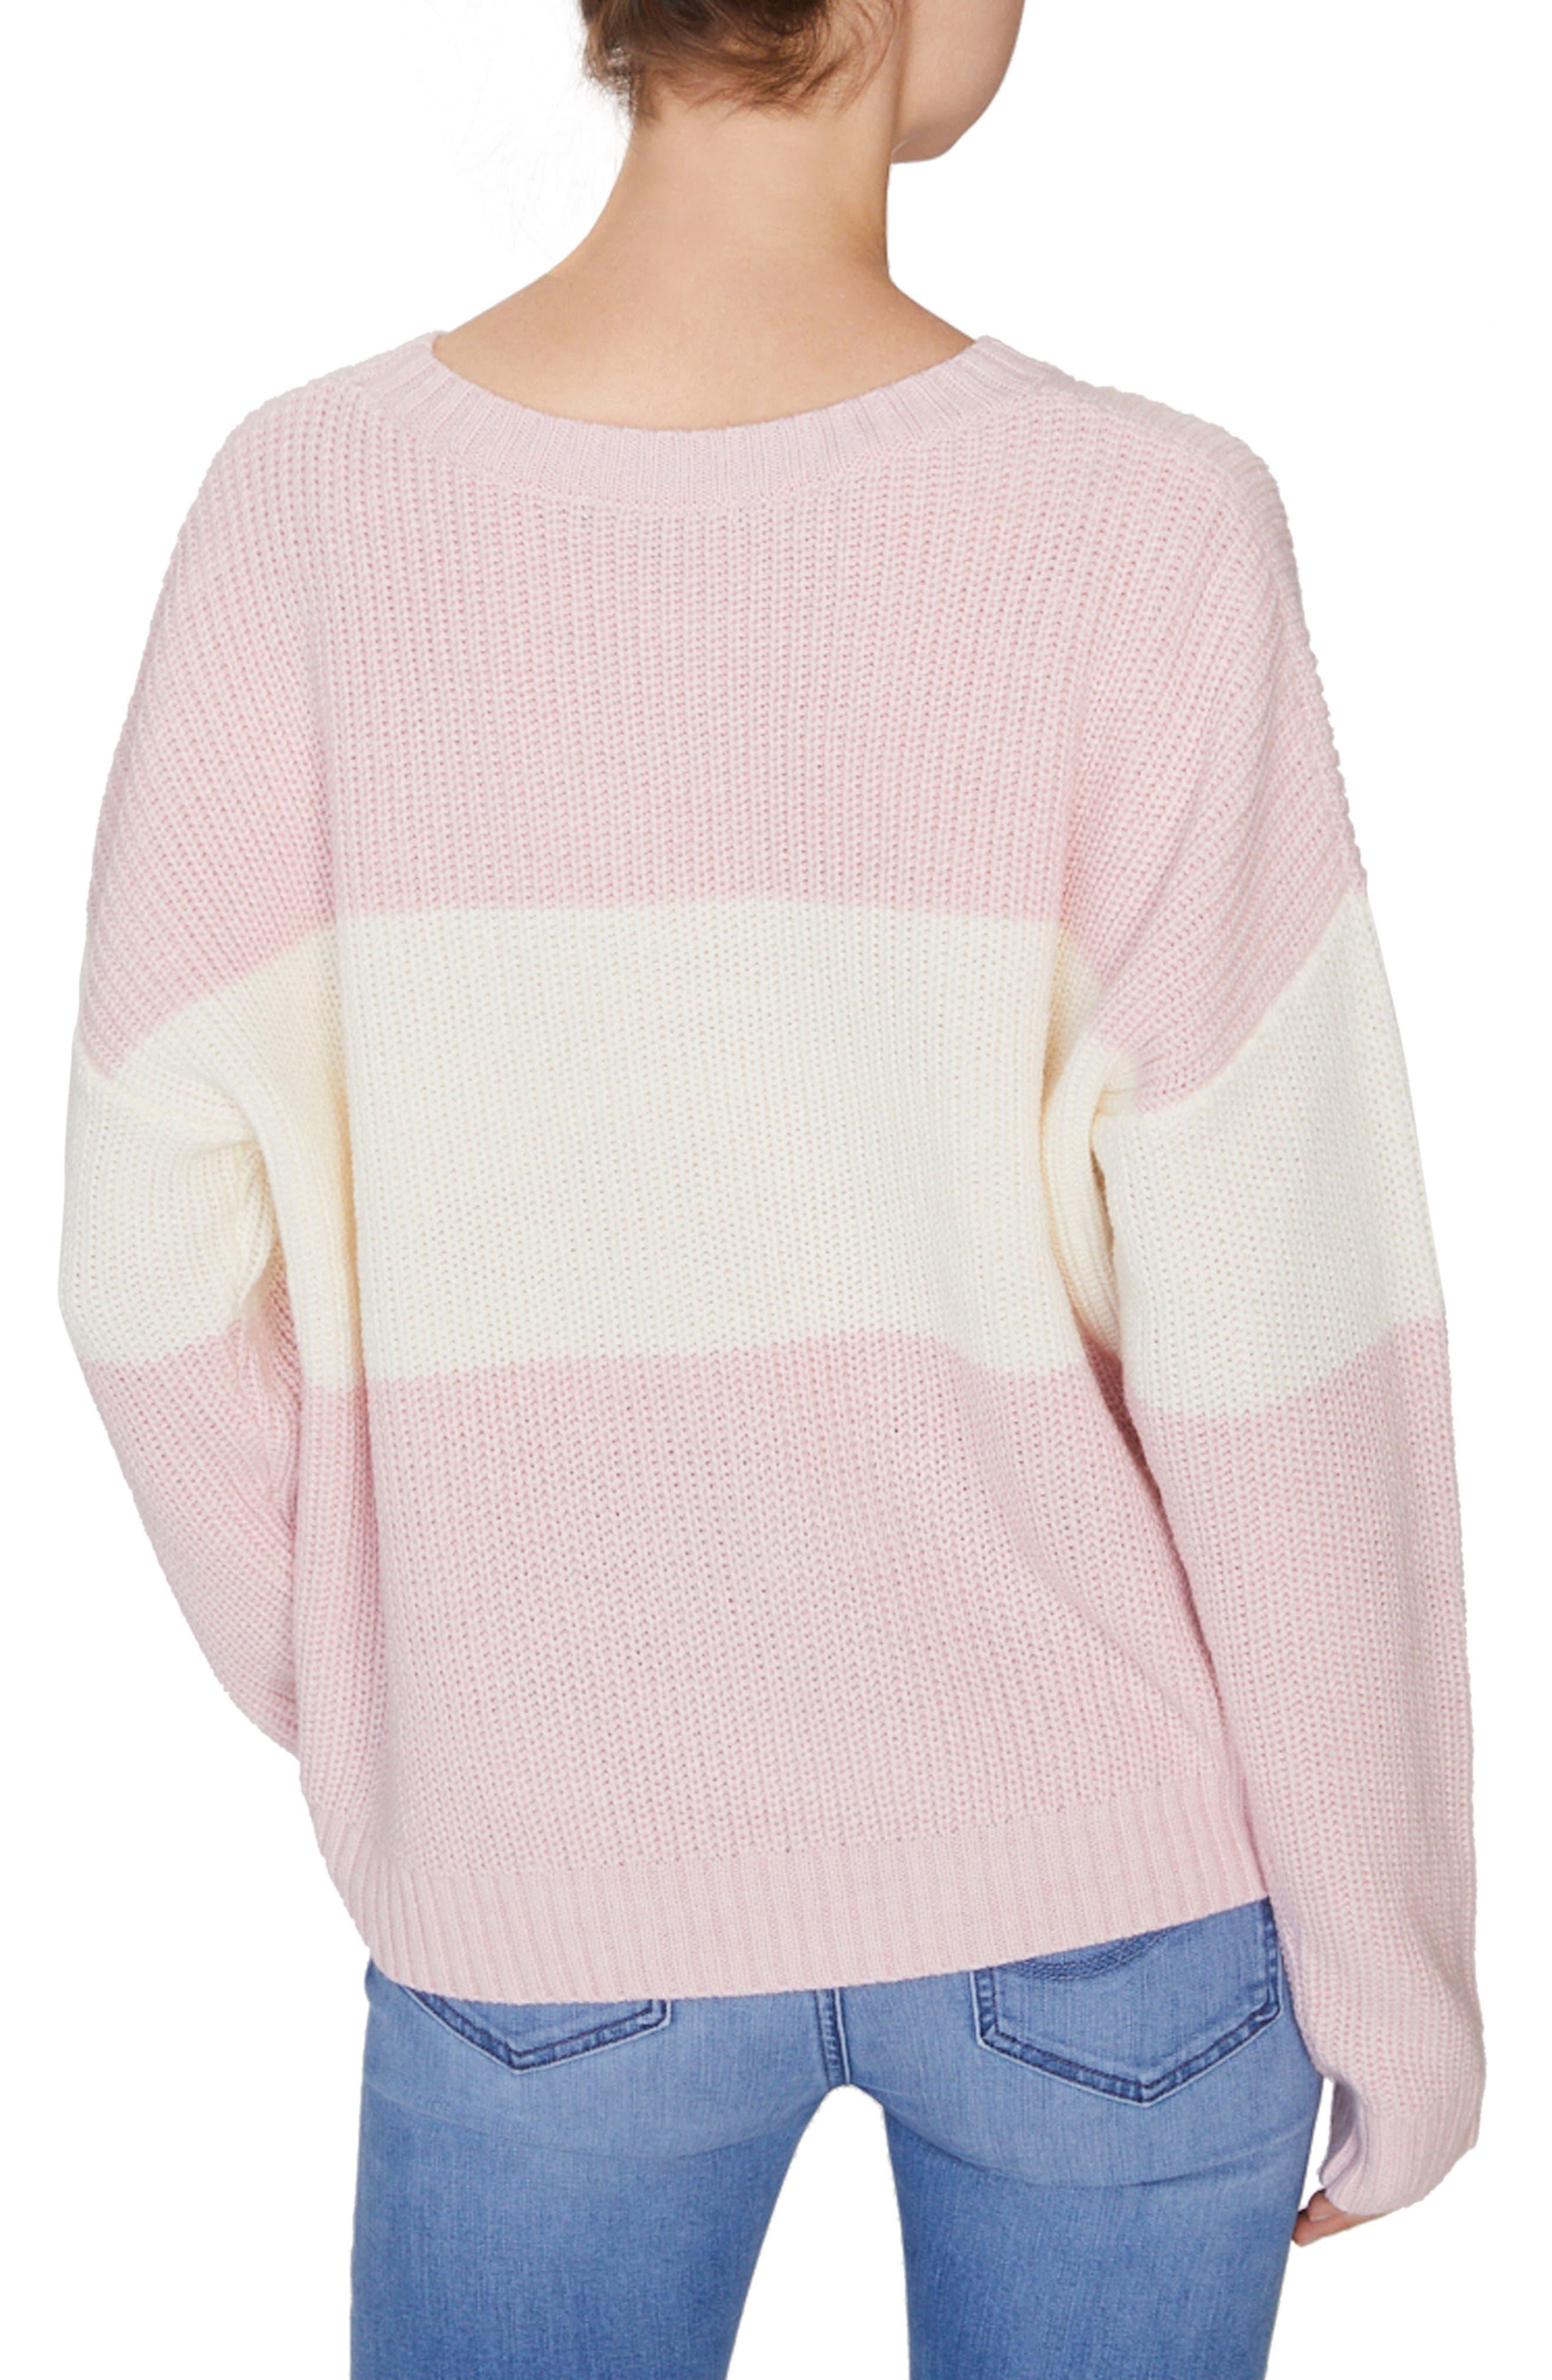 SANCTUARY,                             Billie Colorblock Shaker Sweater,                             Alternate thumbnail 2, color,                             HEATHER CHERRYBLOSSOM/ NATURAL